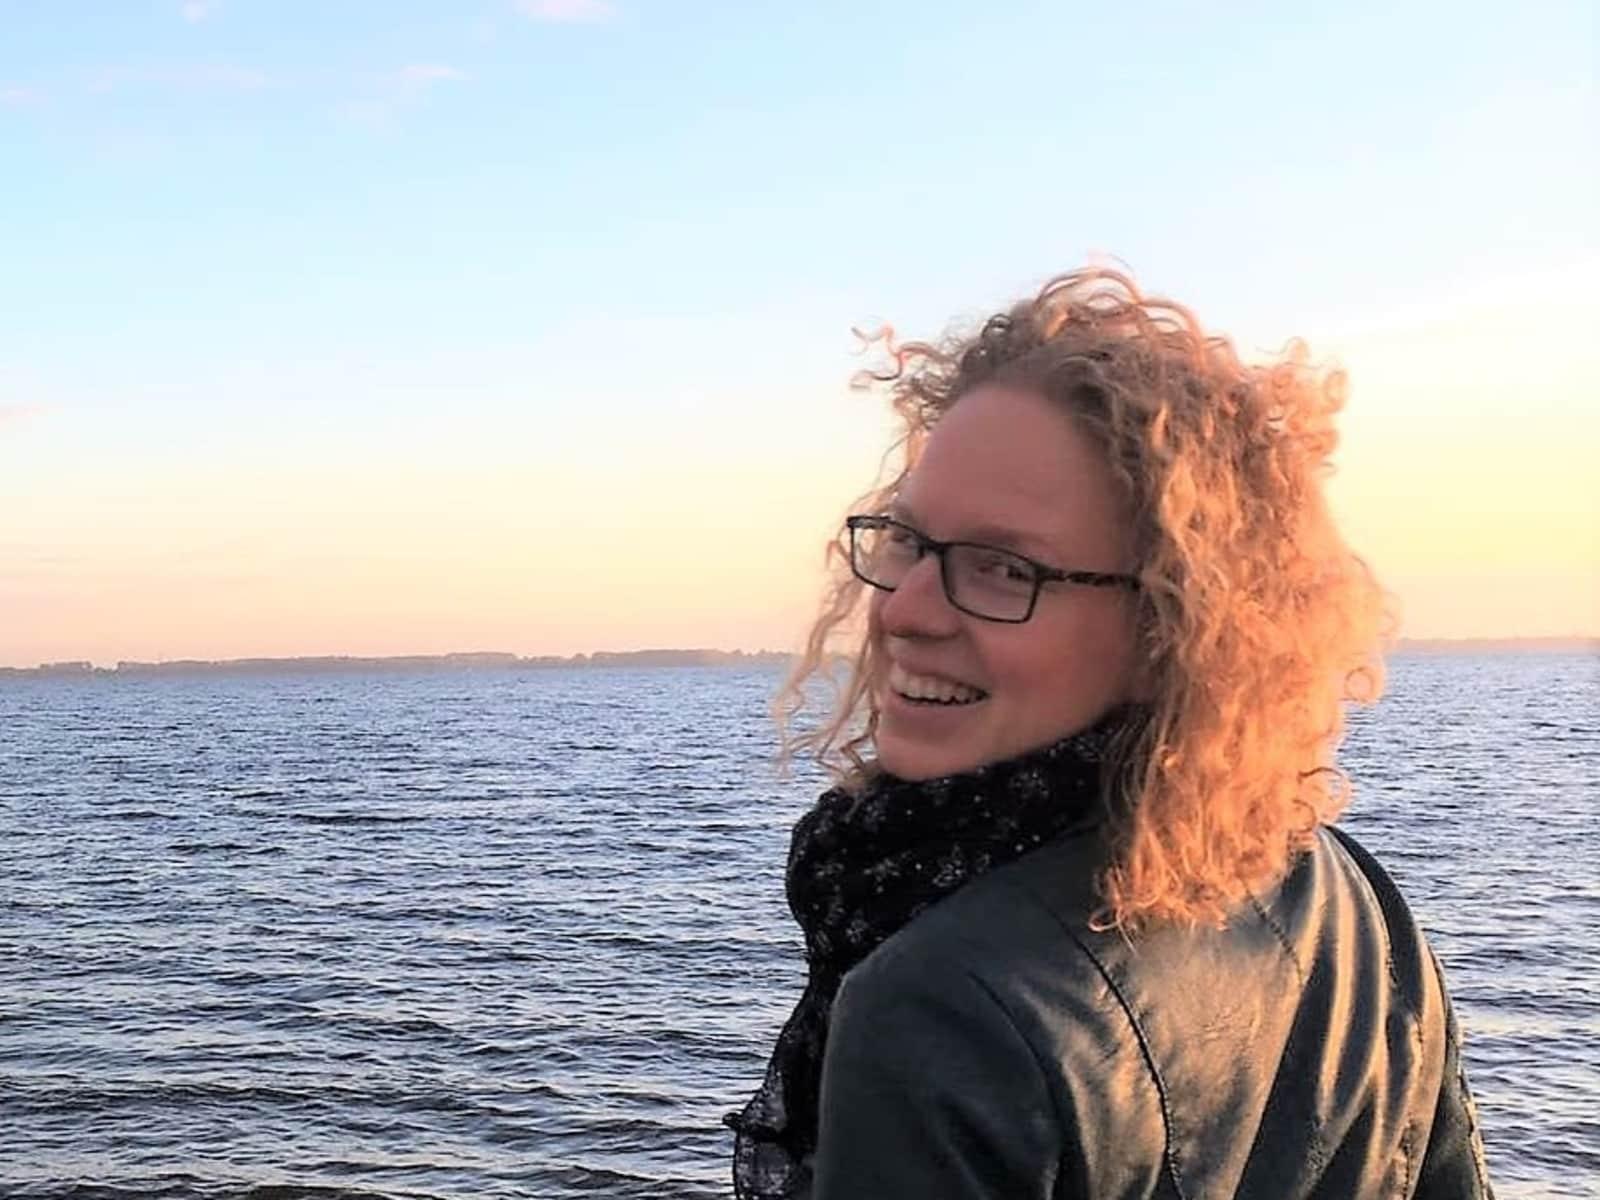 Karin from Utrecht, Netherlands